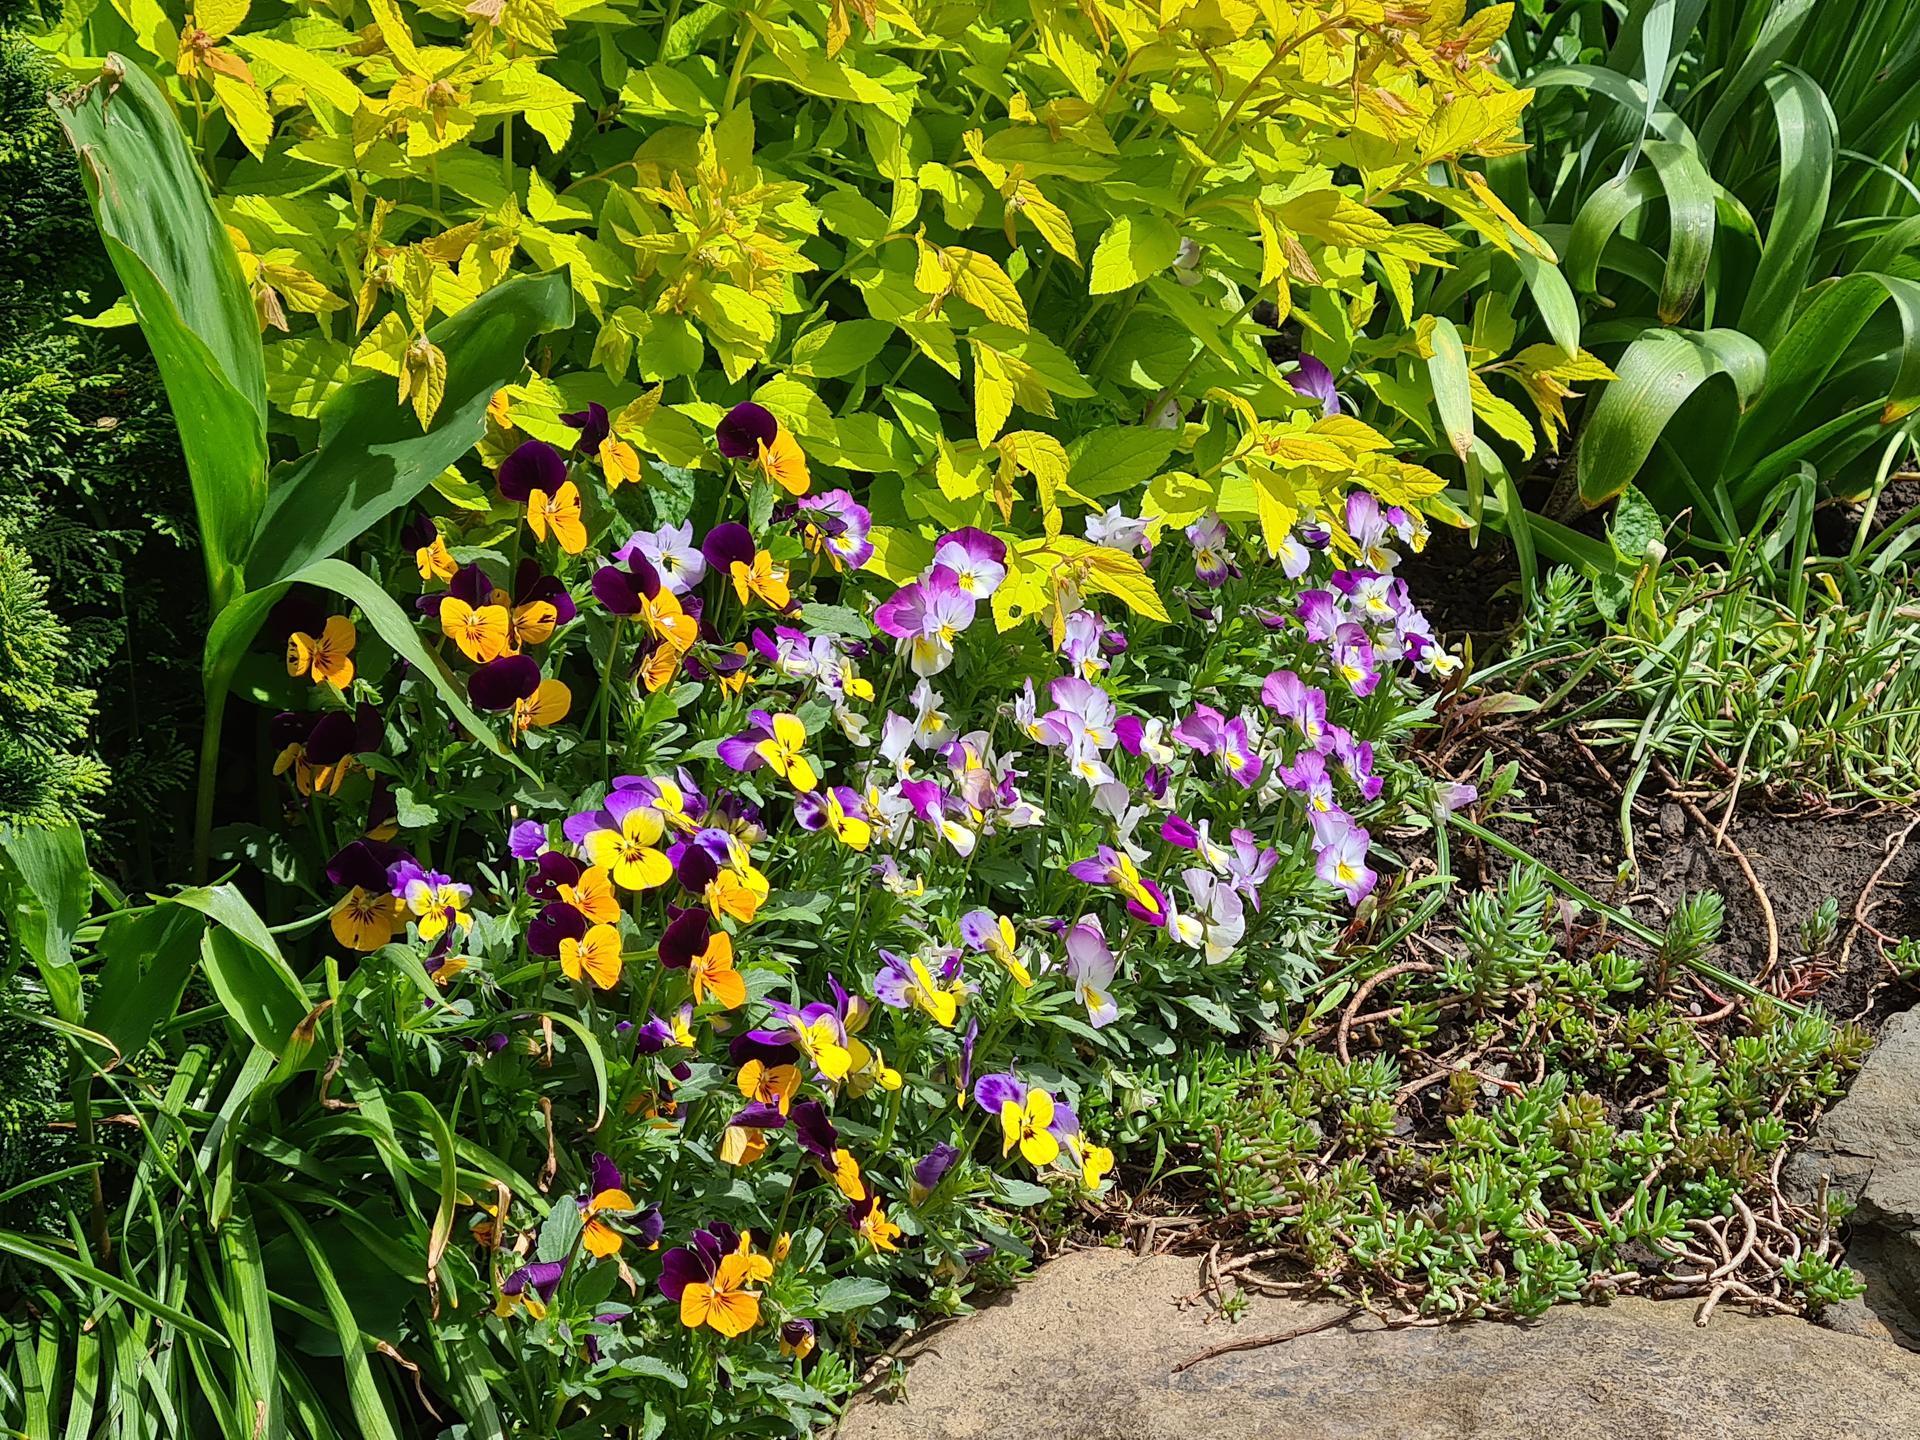 Naša záhradka 2021 - Macesky na jar kupene, stale robia paradu